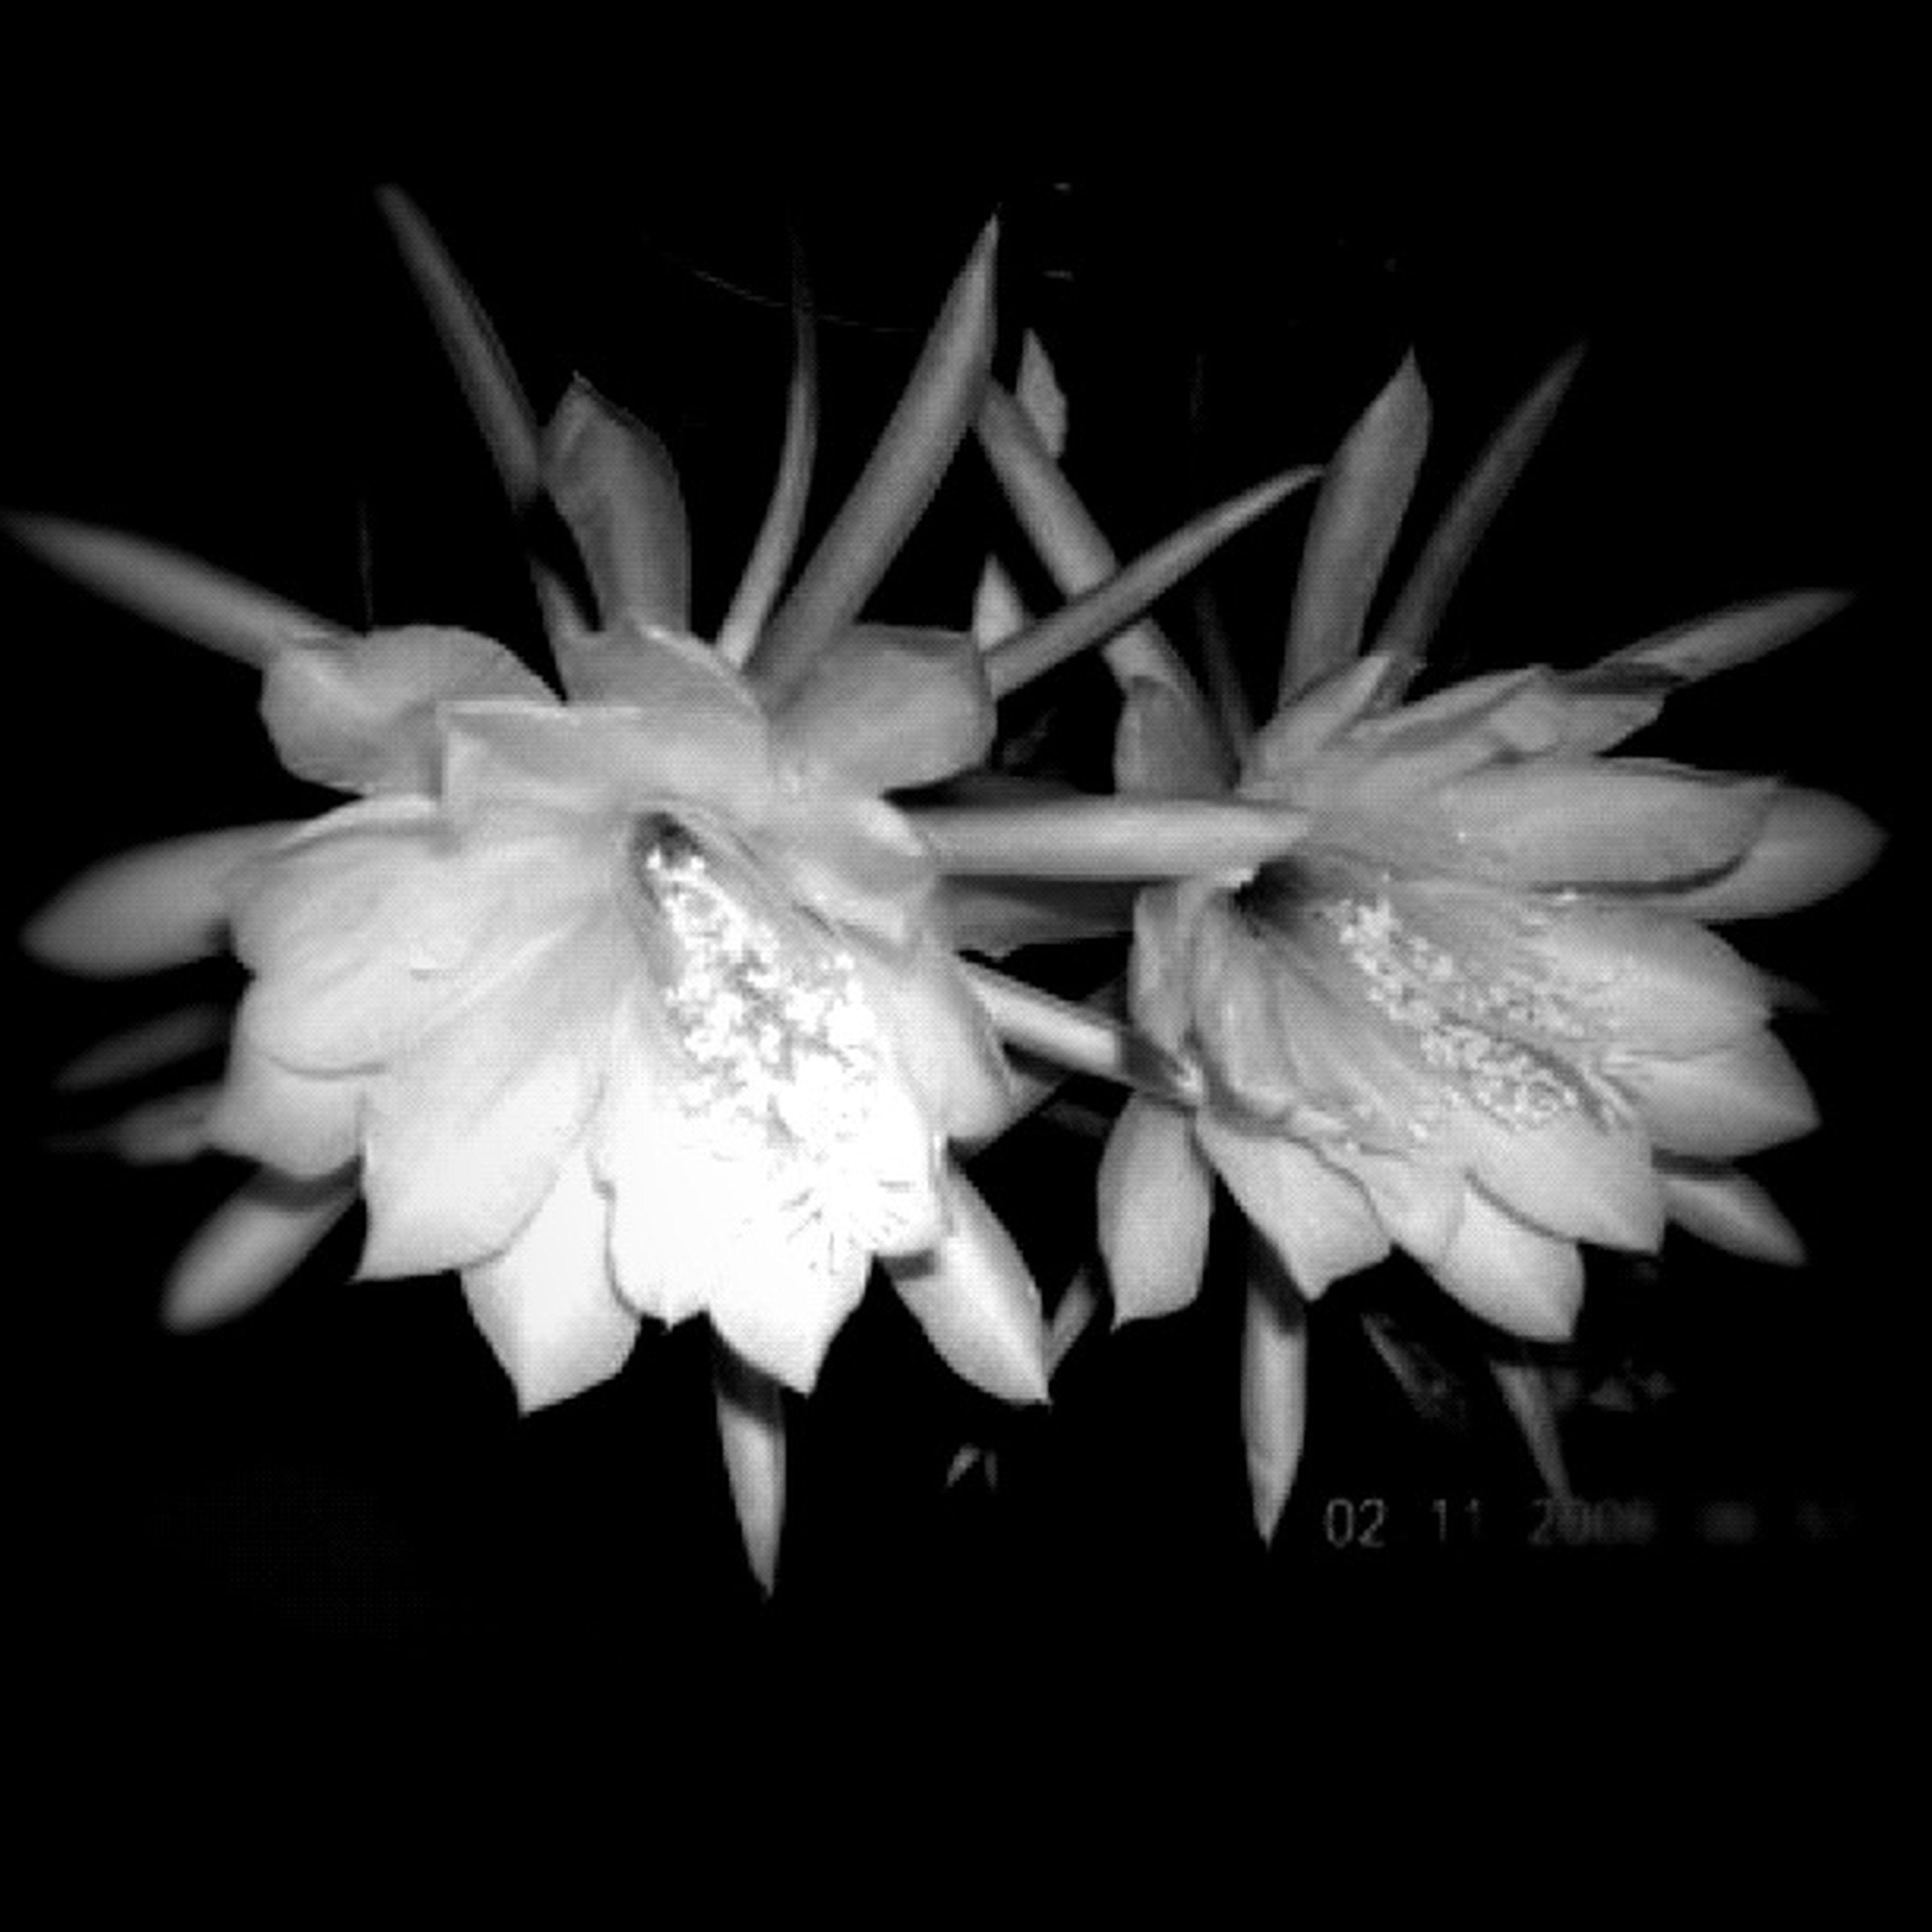 flower, petal, freshness, fragility, flower head, drop, water, wet, close-up, beauty in nature, growth, black background, single flower, nature, studio shot, blooming, pollen, dew, plant, stamen